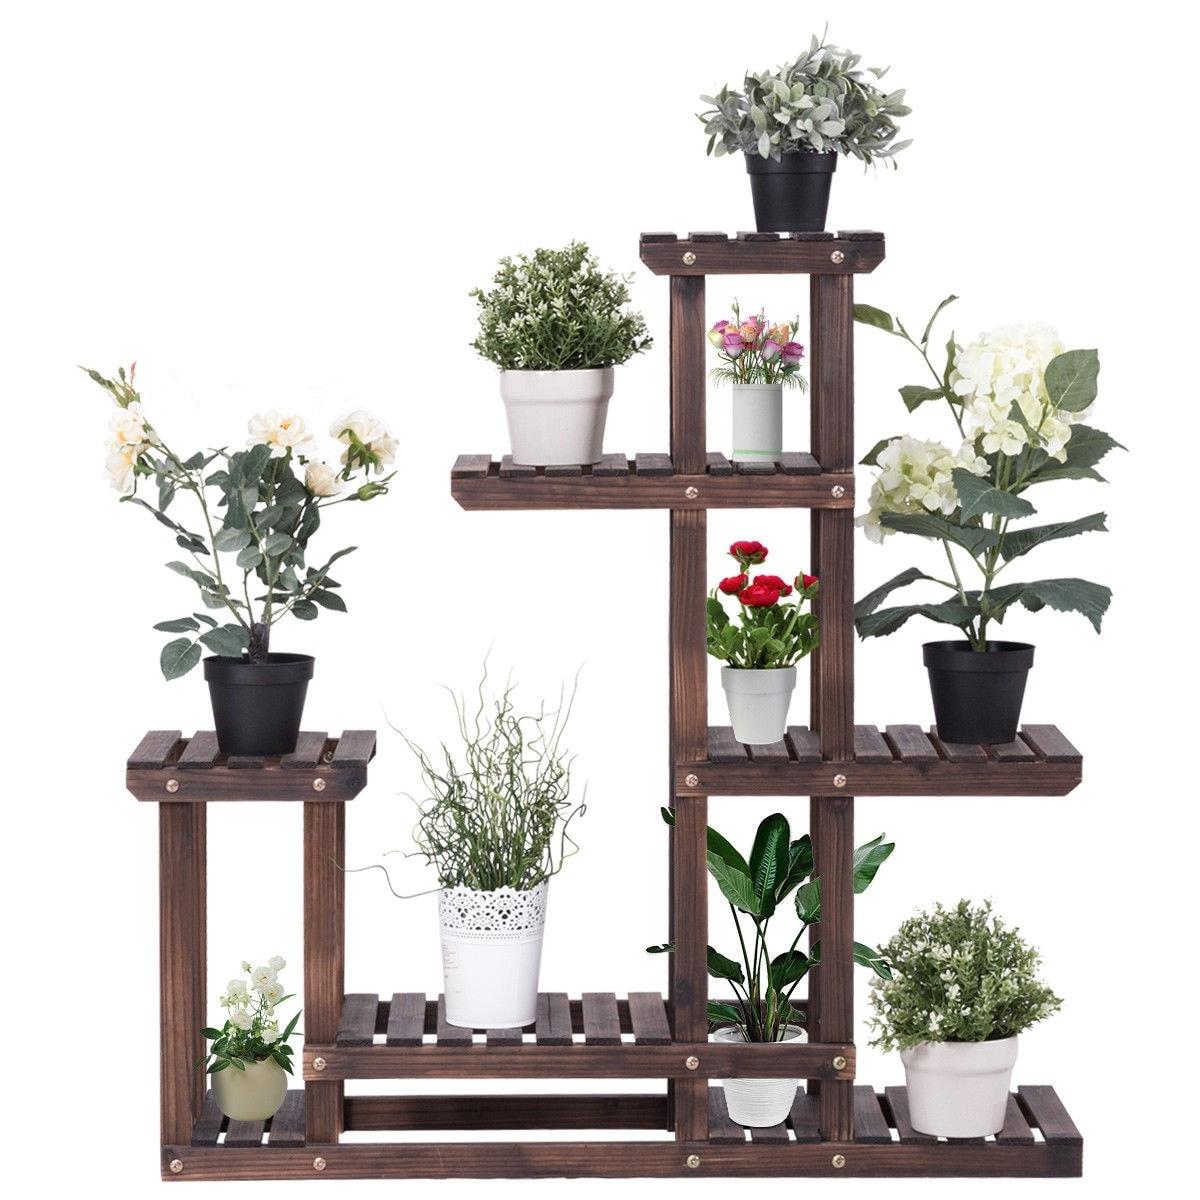 Outdoor Wooden Plant Flower Rack Display Stand 6 Wood Shelves Garden 40x10x38